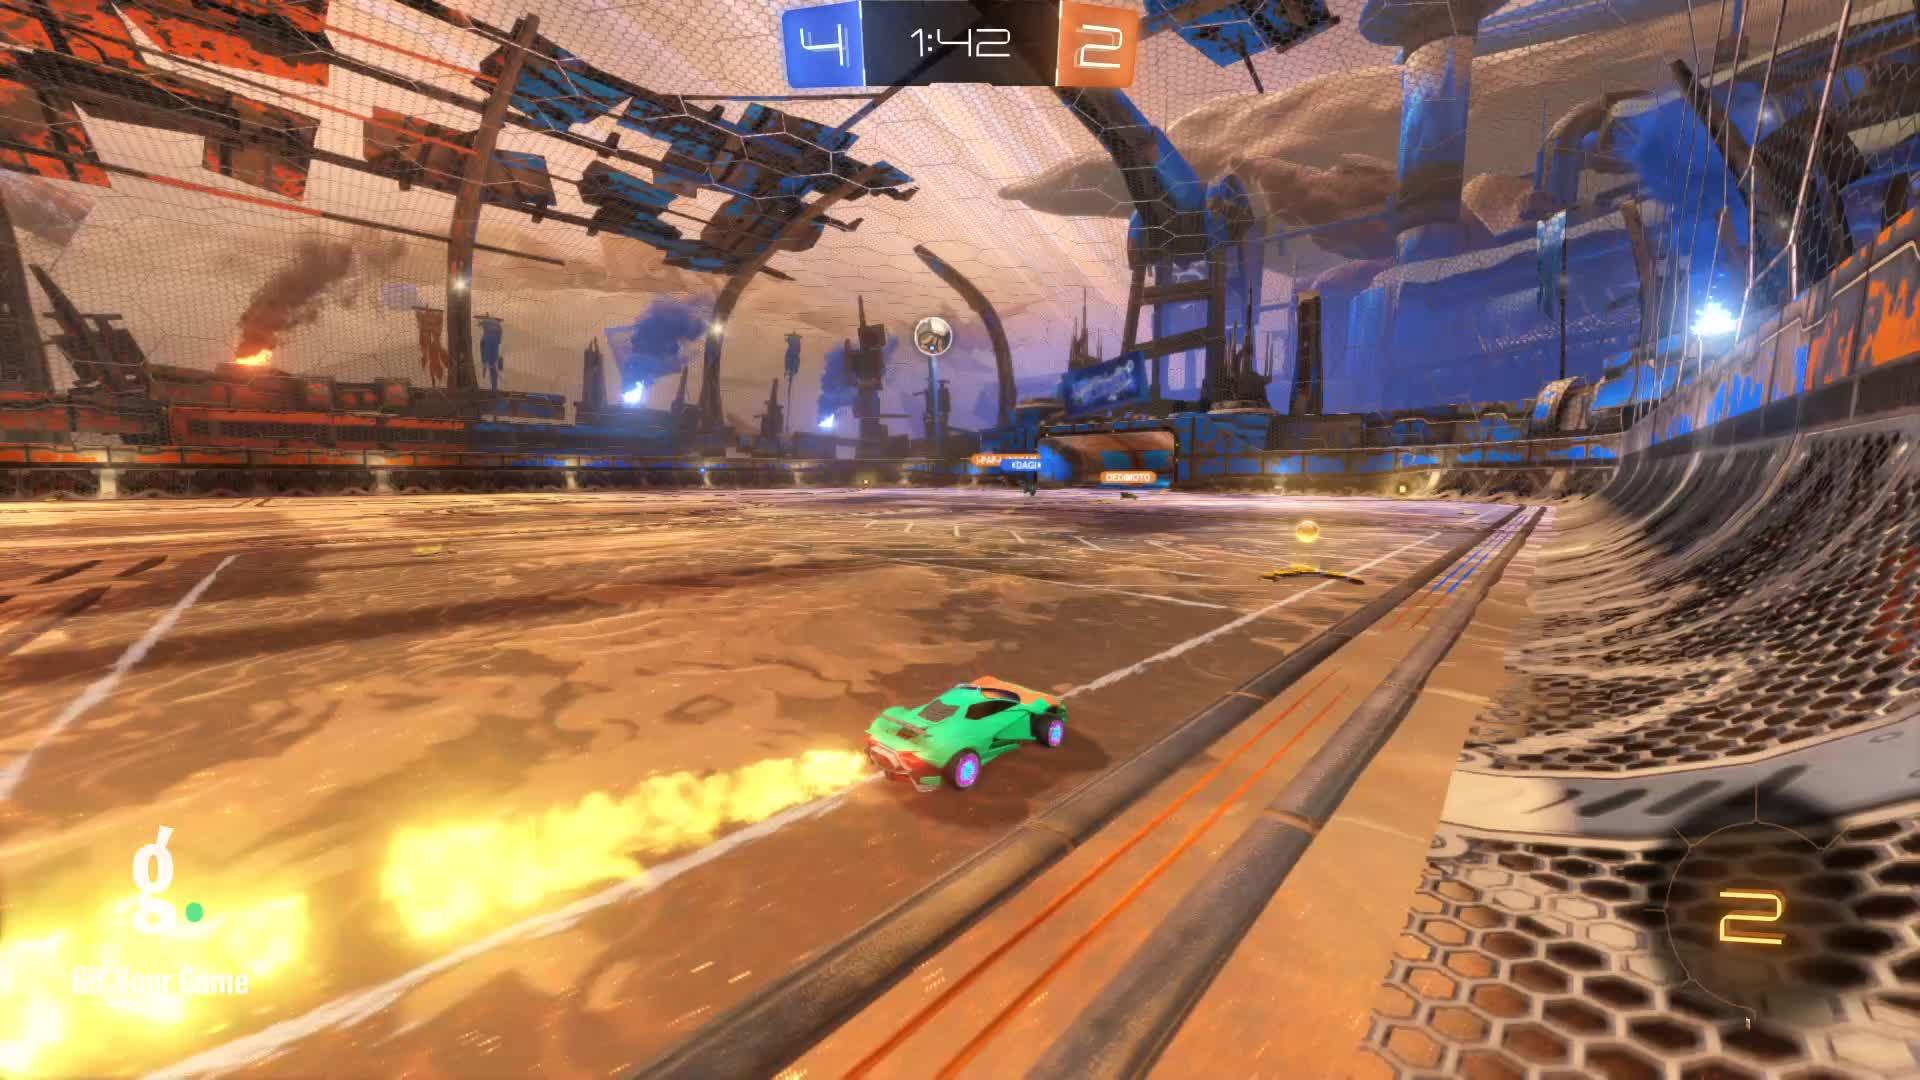 Gif Your Game, GifYourGame, Goal, Rocket League, RocketLeague, snus, Goal 7: snus GIFs